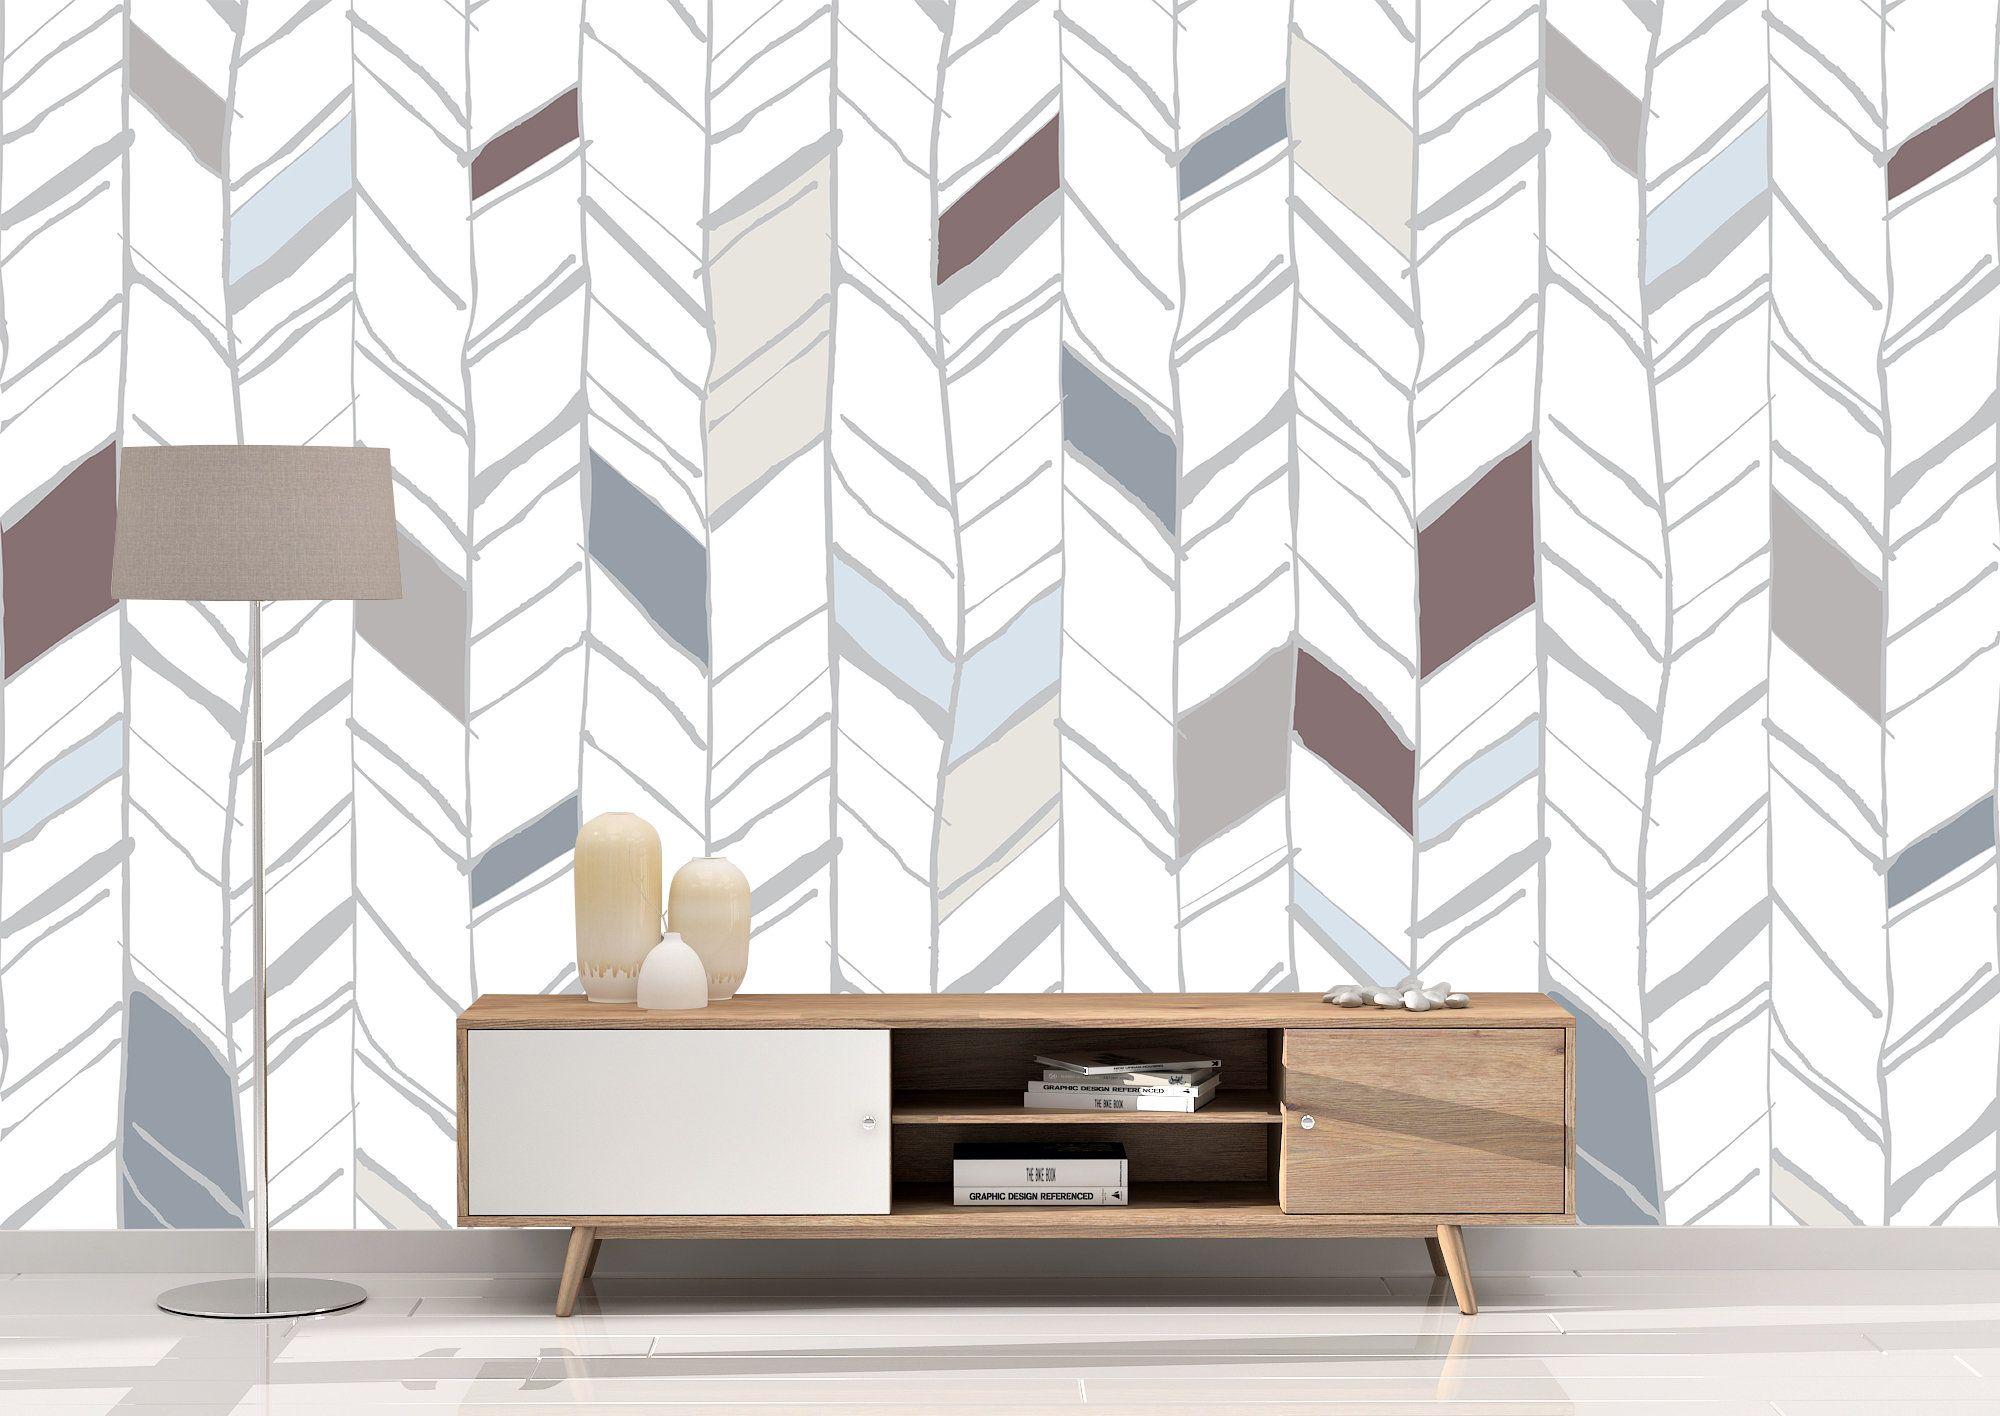 Herringbone Line Navy Peel And Stick Wallpaper Striped Walls Bedroom Wallpaper Walls Bedroom Peel And Stick Wallpaper